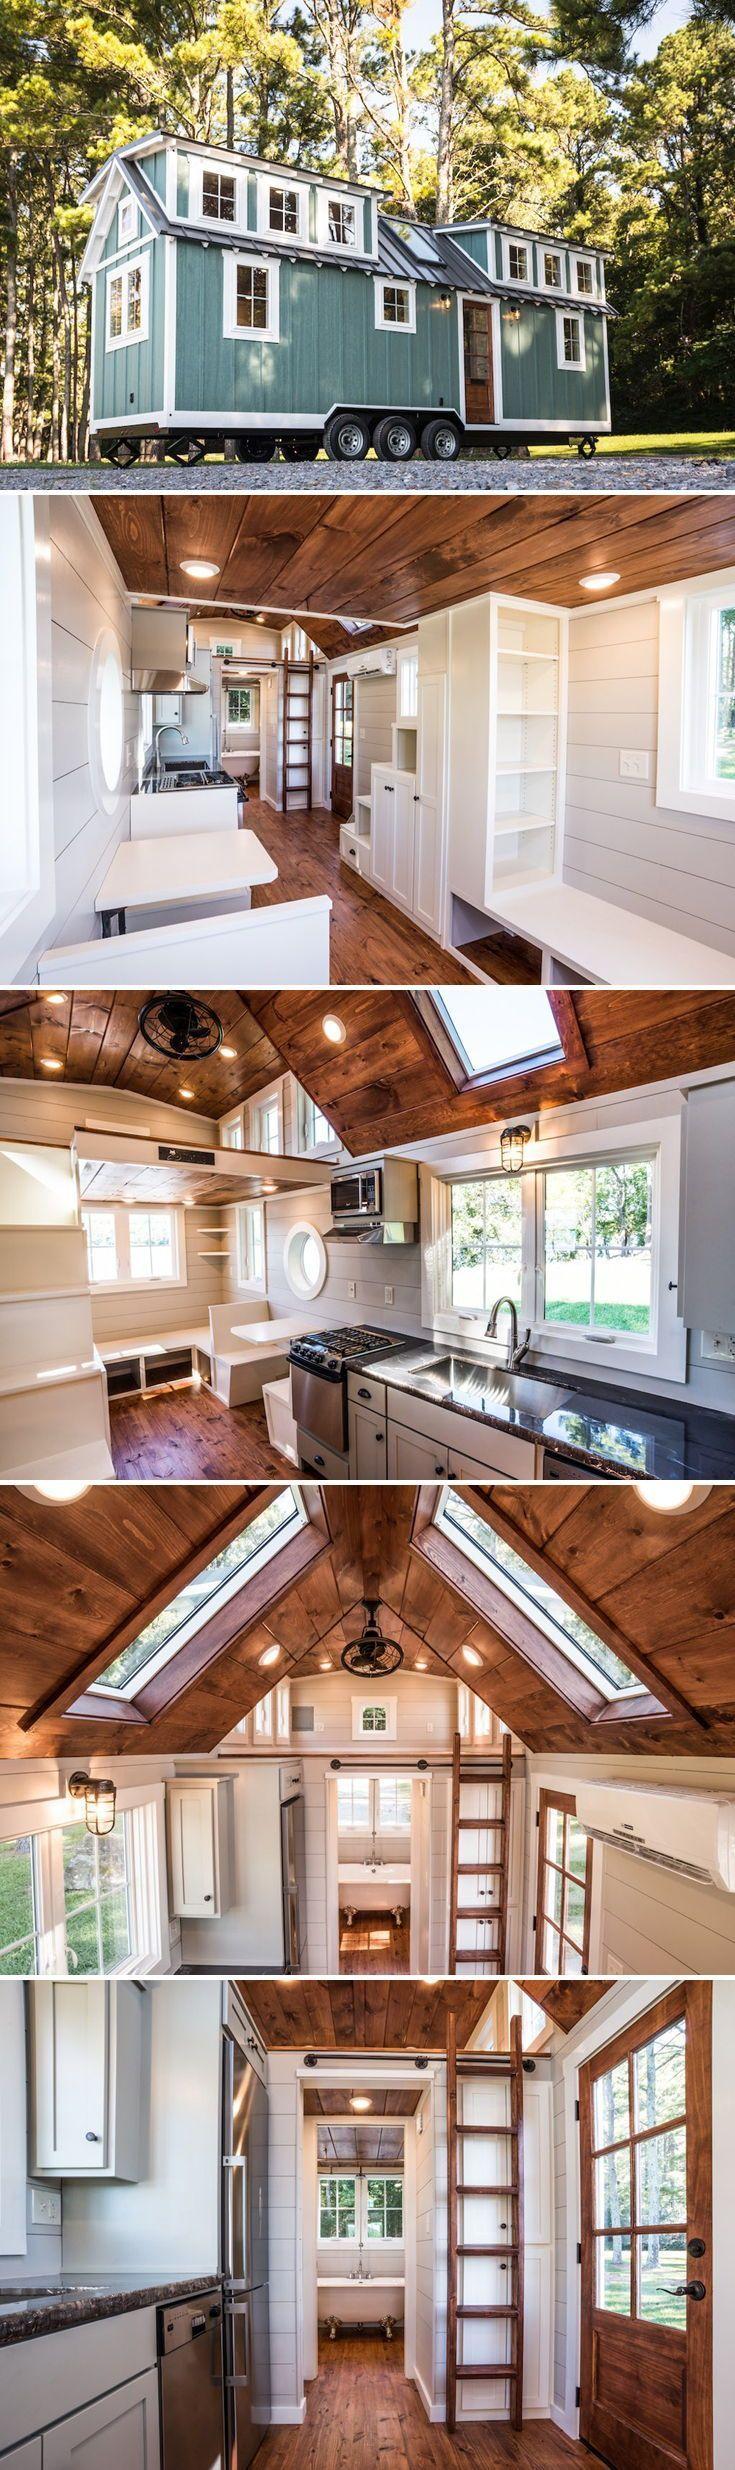 Ridgewood by Timbercraft Tiny Homes, #beautifulhouseinthewoodstinyhomes #Homes #Ridgewood #T...